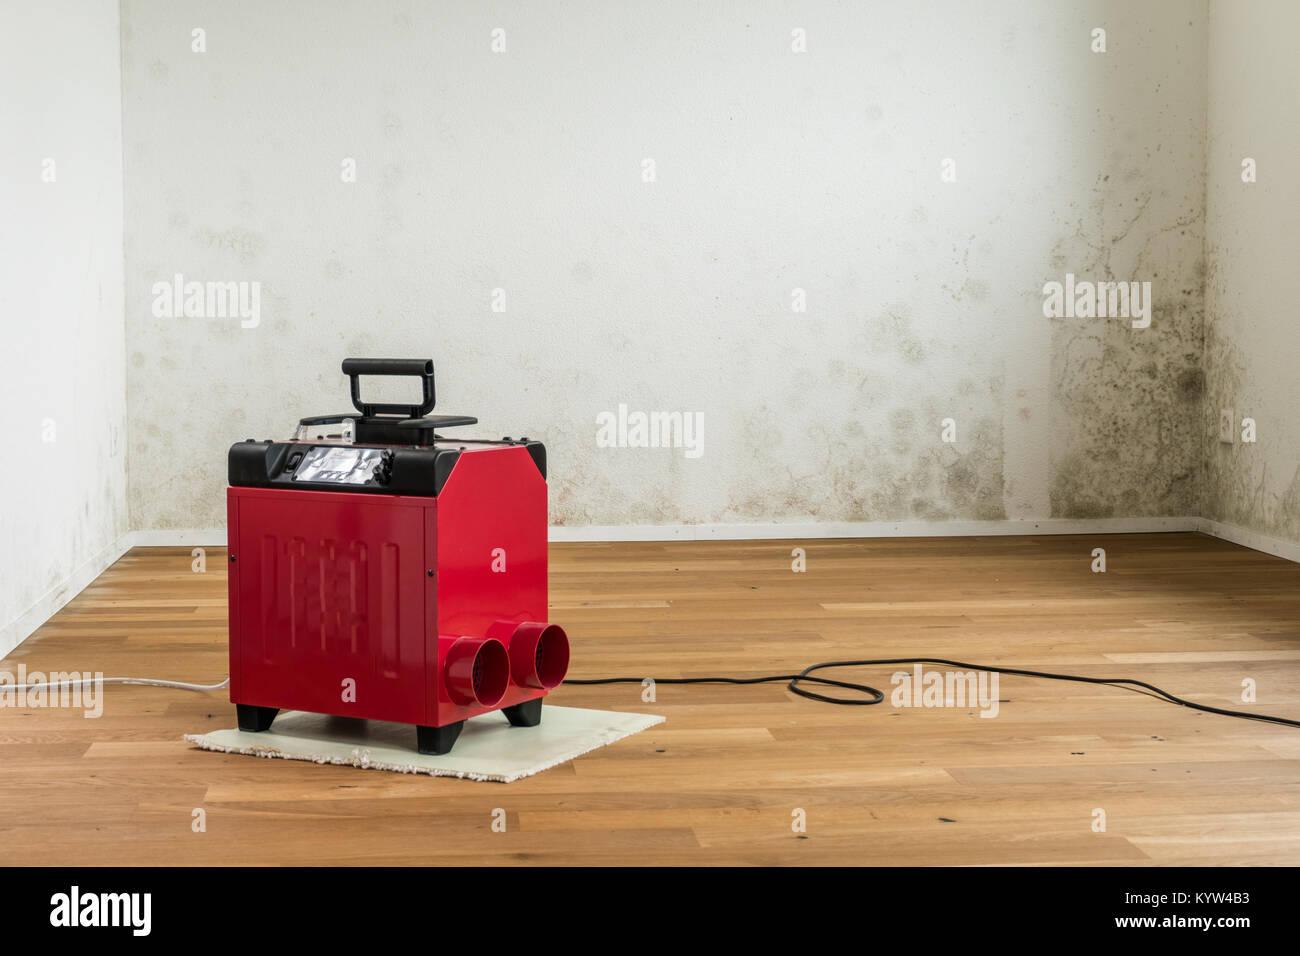 mold spots photos mold spots images alamy. Black Bedroom Furniture Sets. Home Design Ideas